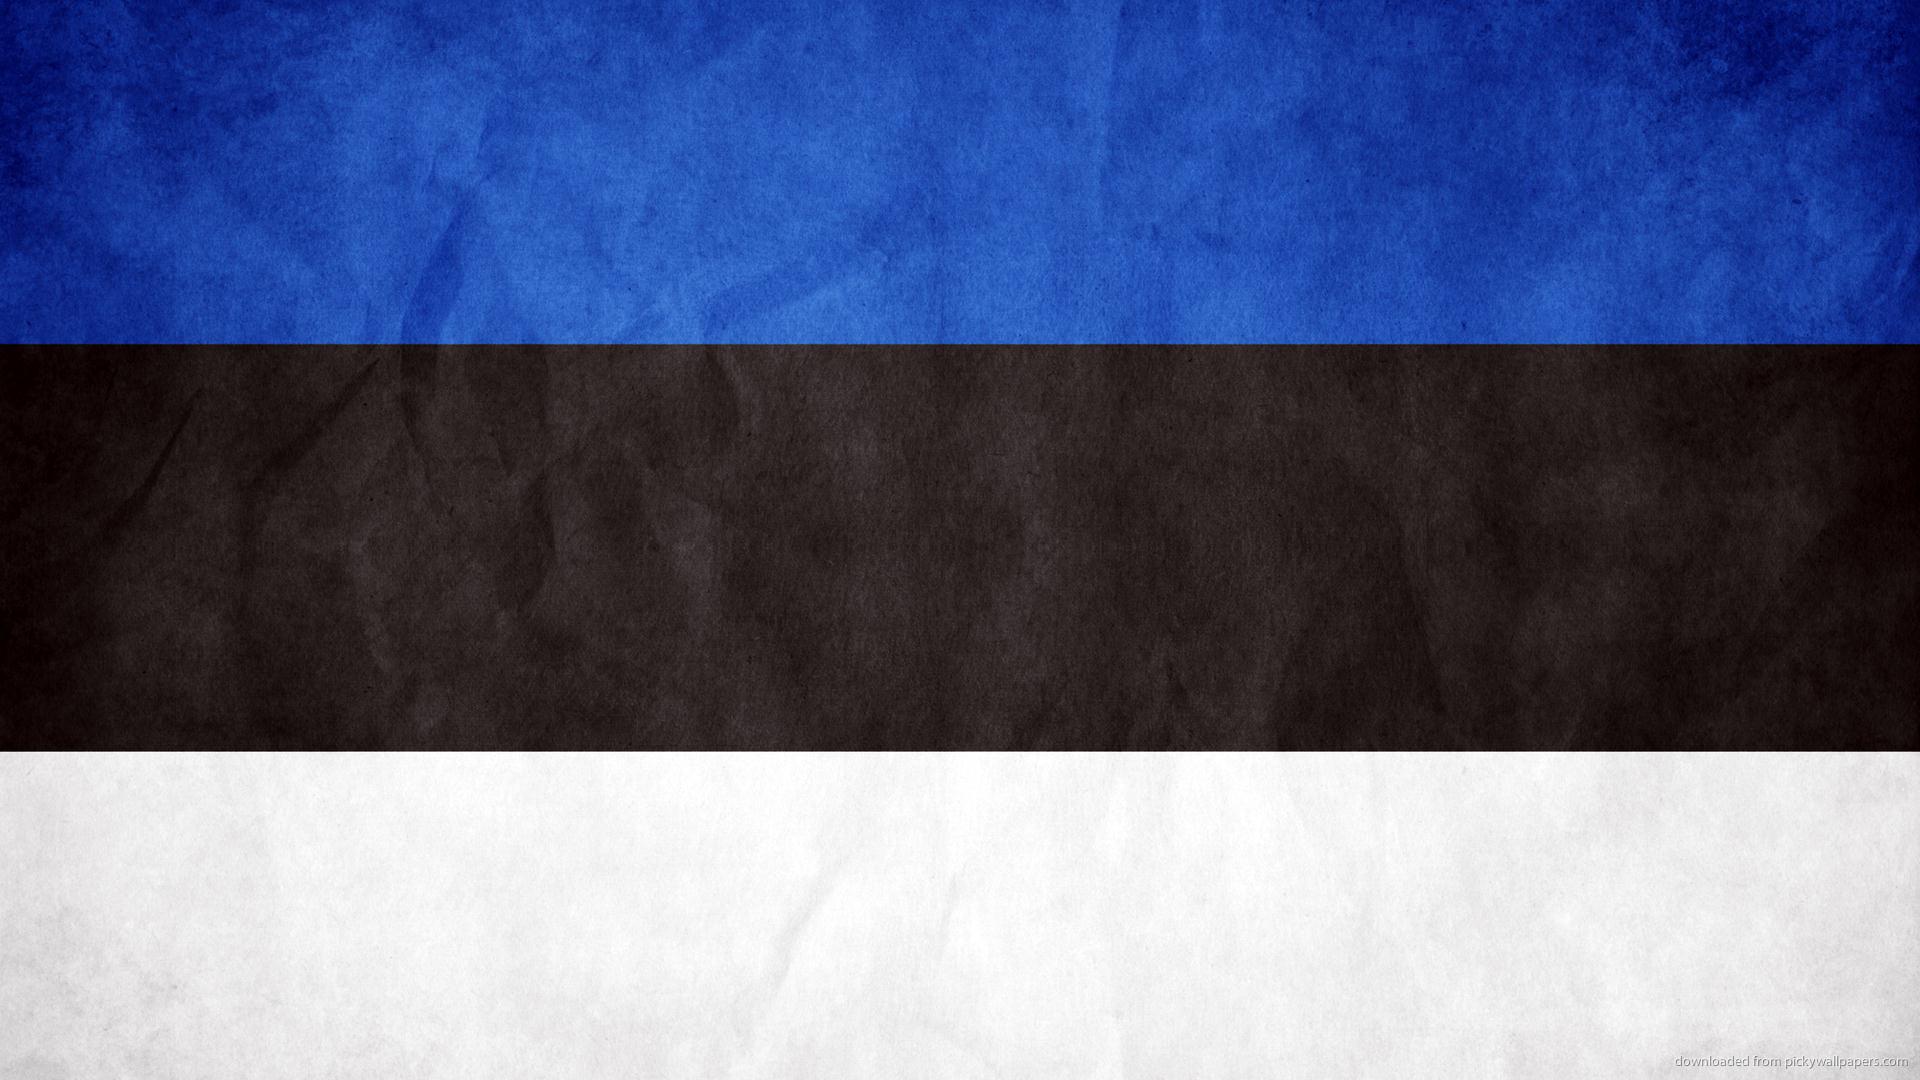 Flag Of Estonia Wallpapers   DodoWallpaper 1920x1080